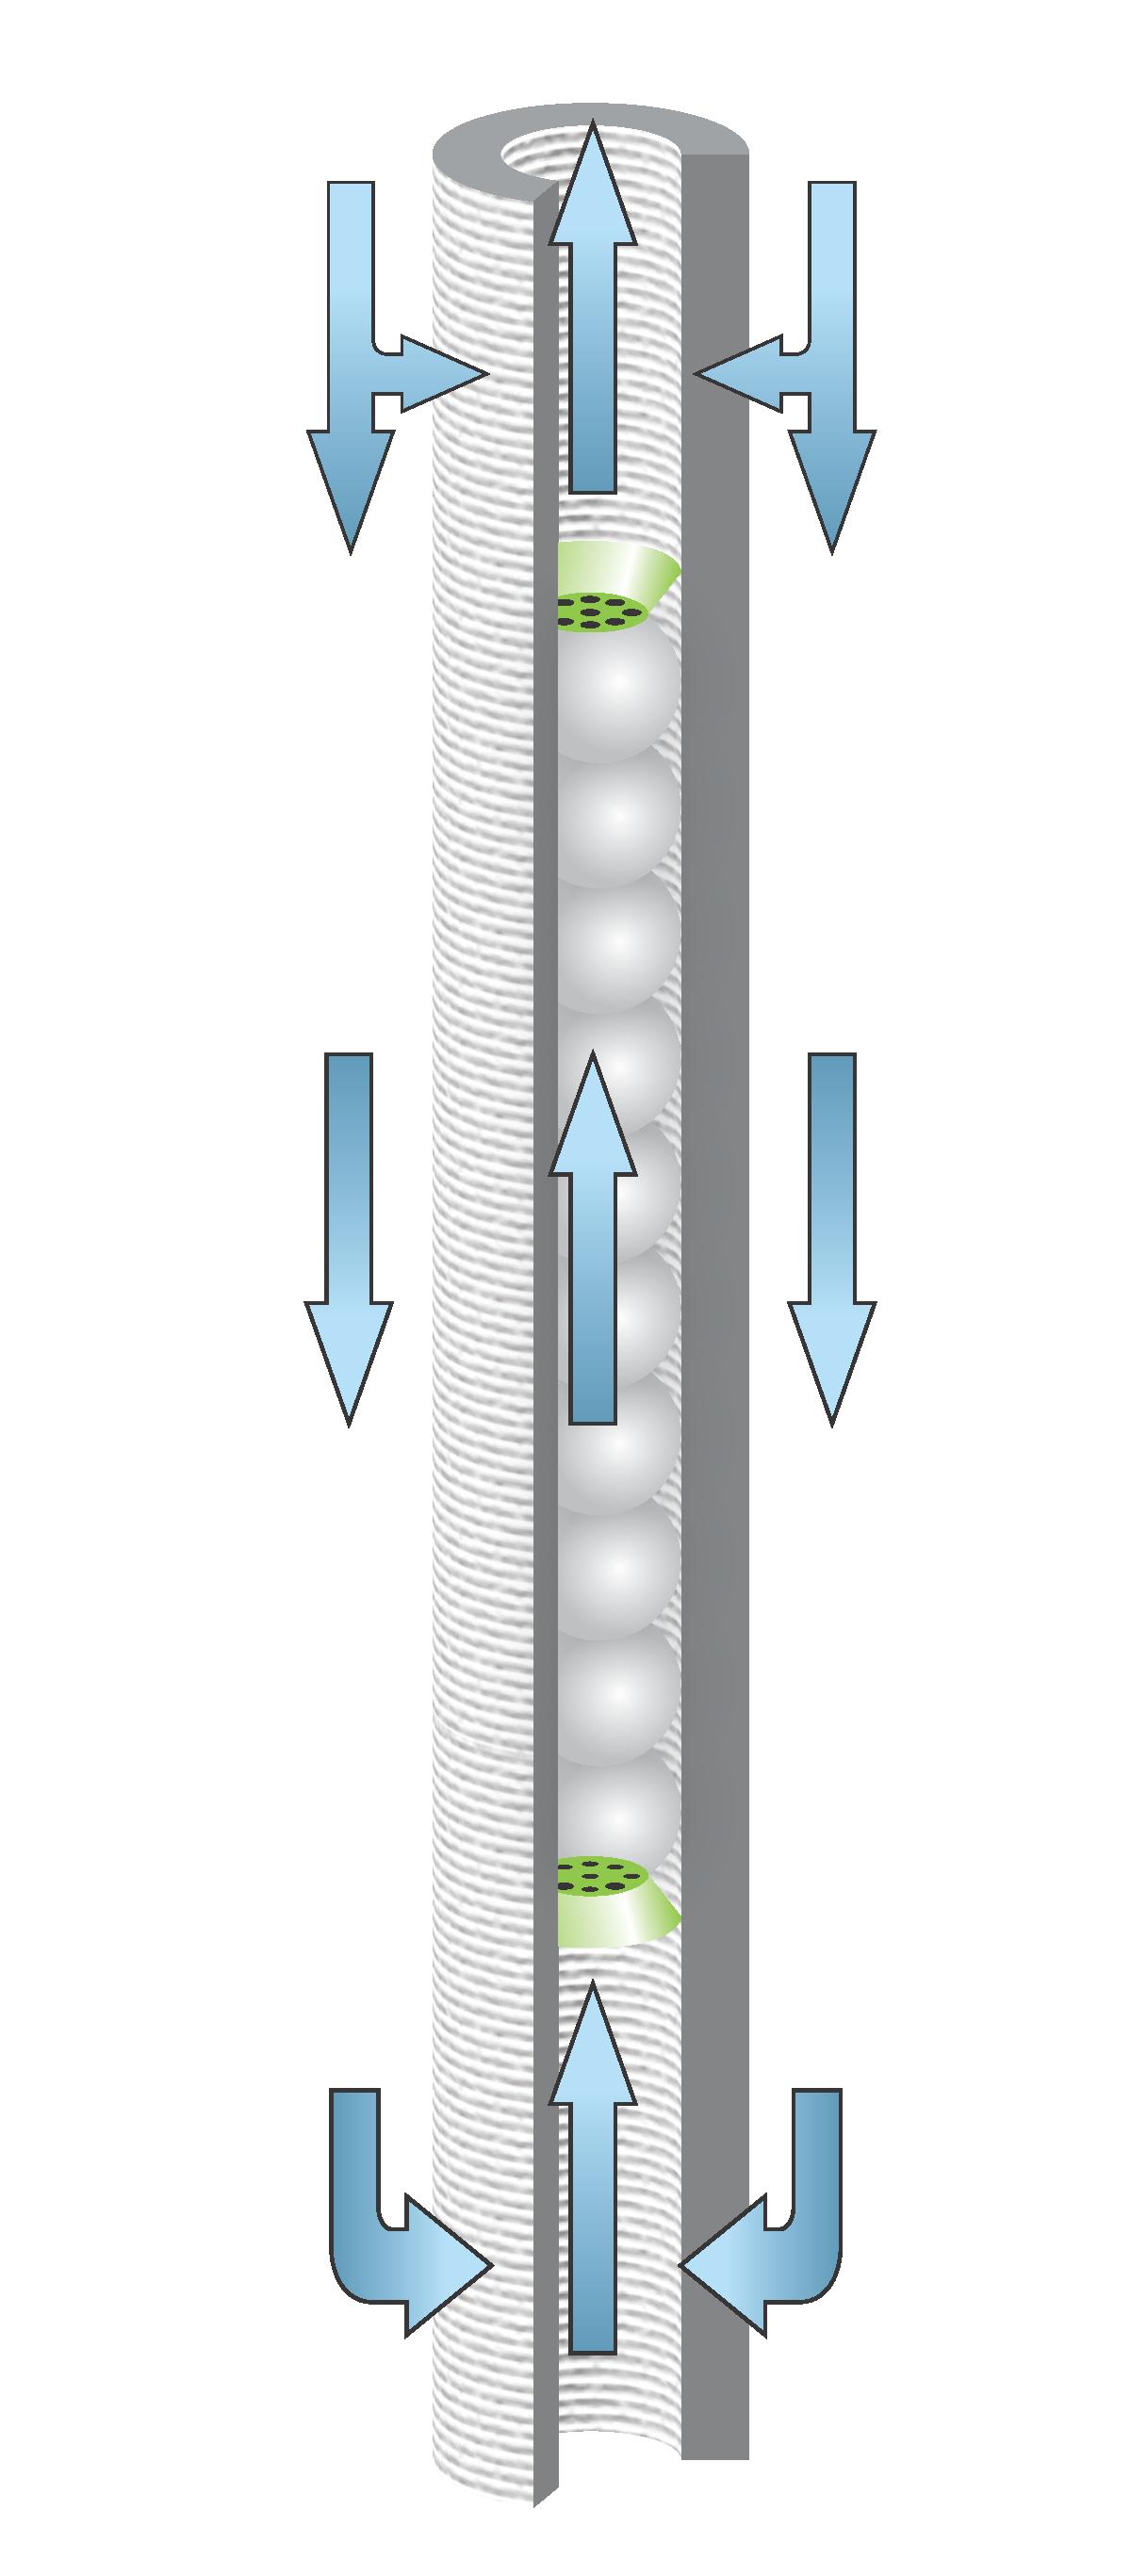 Water Filter Diagram v4 green clips